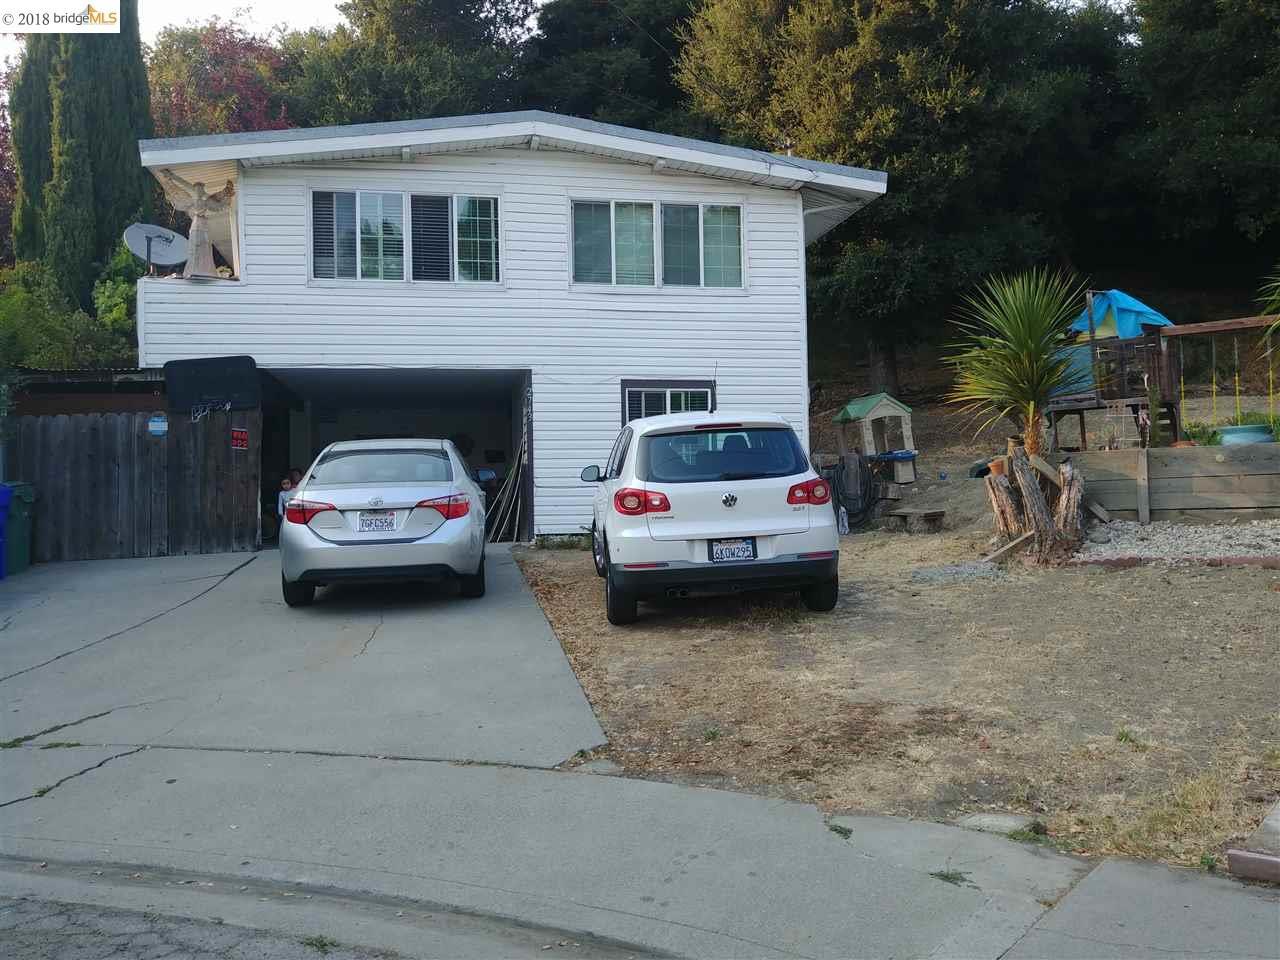 2743 SHELDON CT, RICHMOND, CA 94803